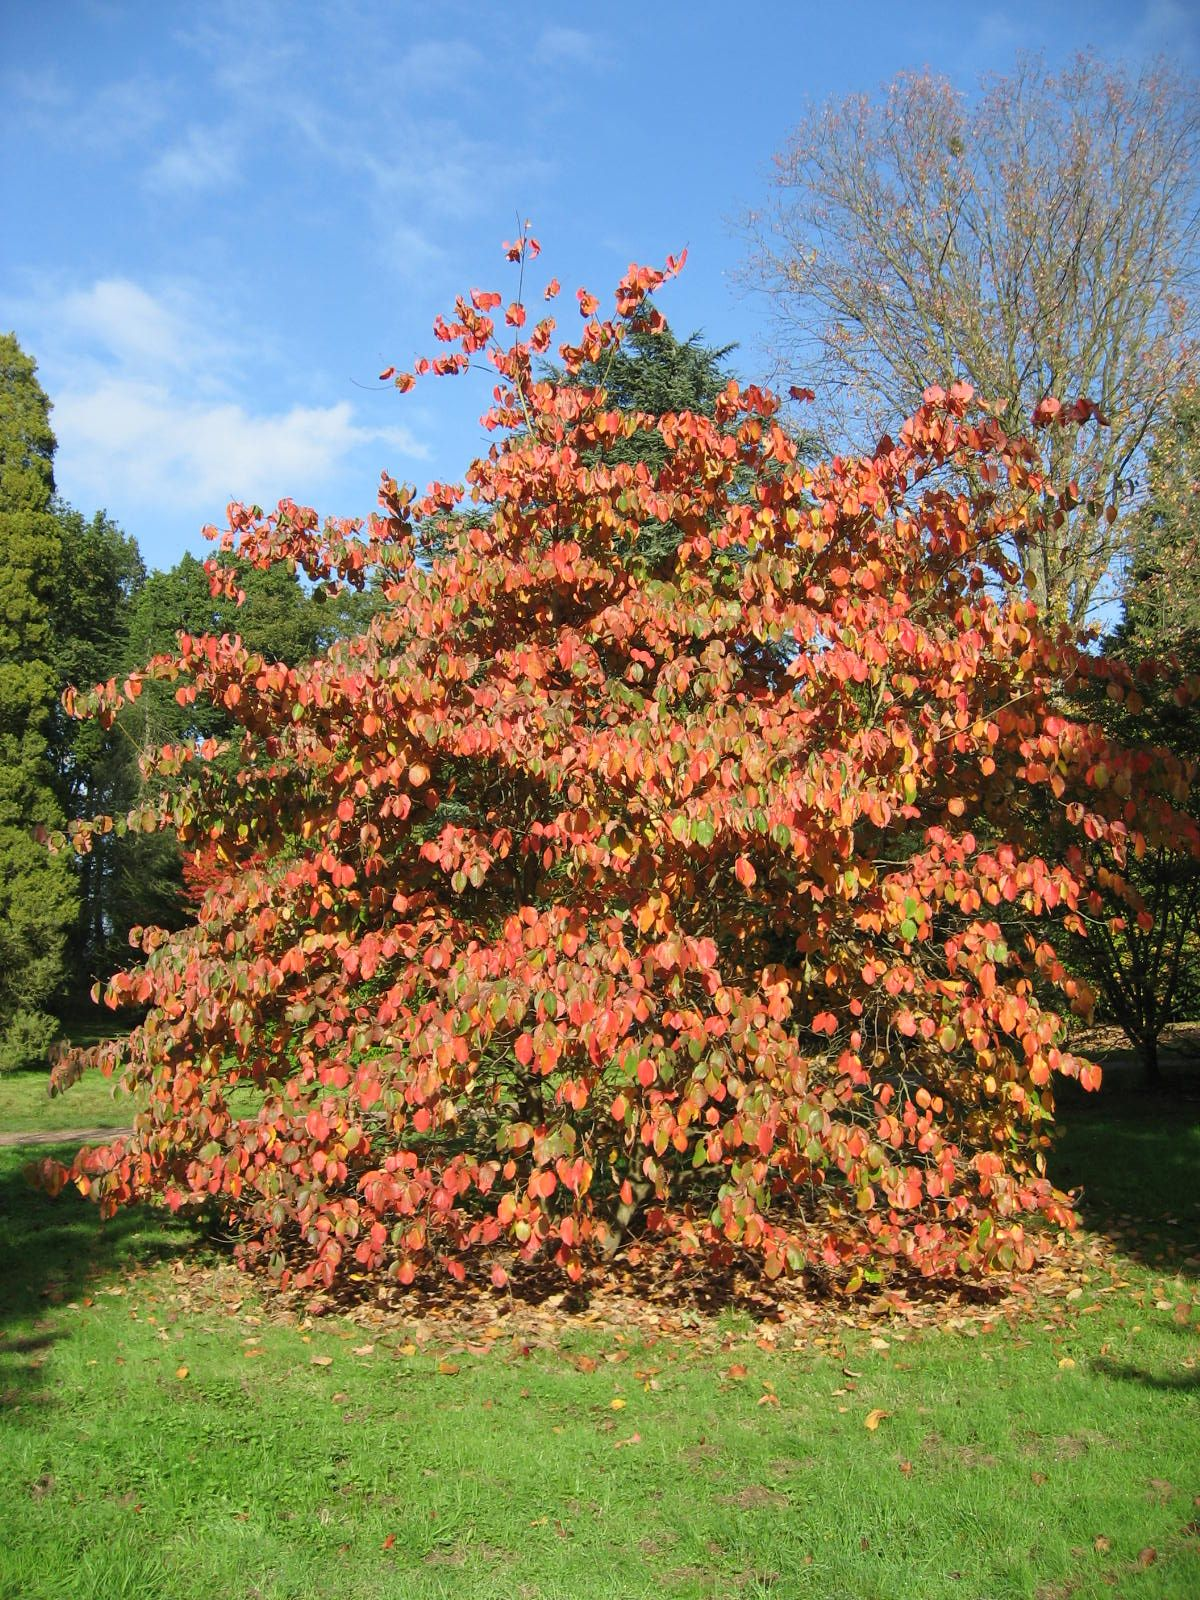 Cornus ormonde is a hybrid of Cornus florida and Cornus nuttalli ...